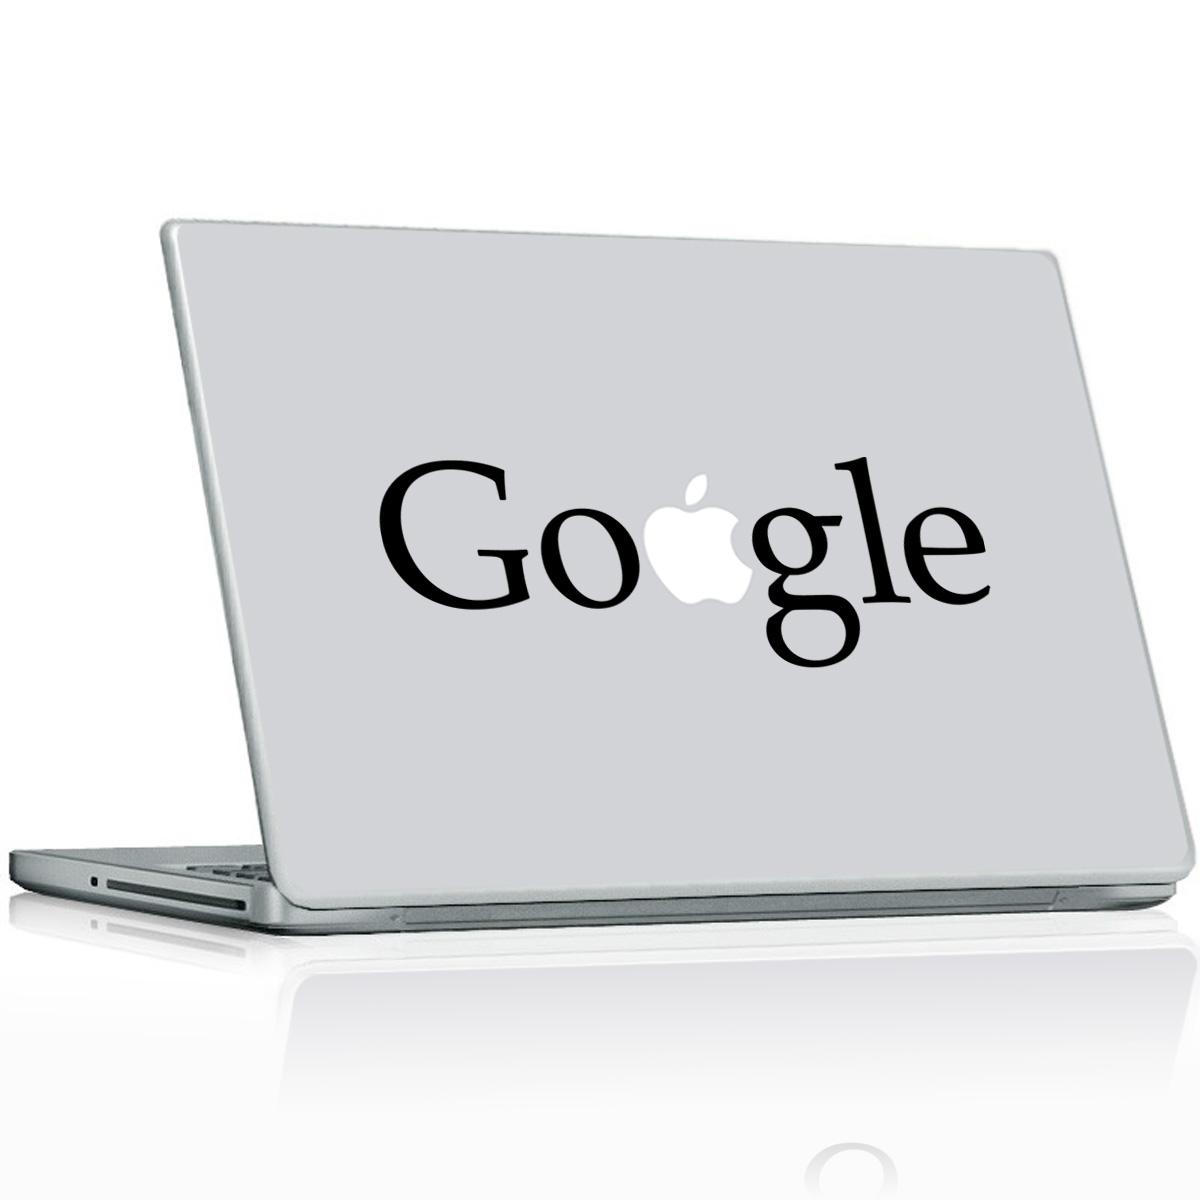 stickers ordinateurs portables sticker google pour mac ambiance. Black Bedroom Furniture Sets. Home Design Ideas